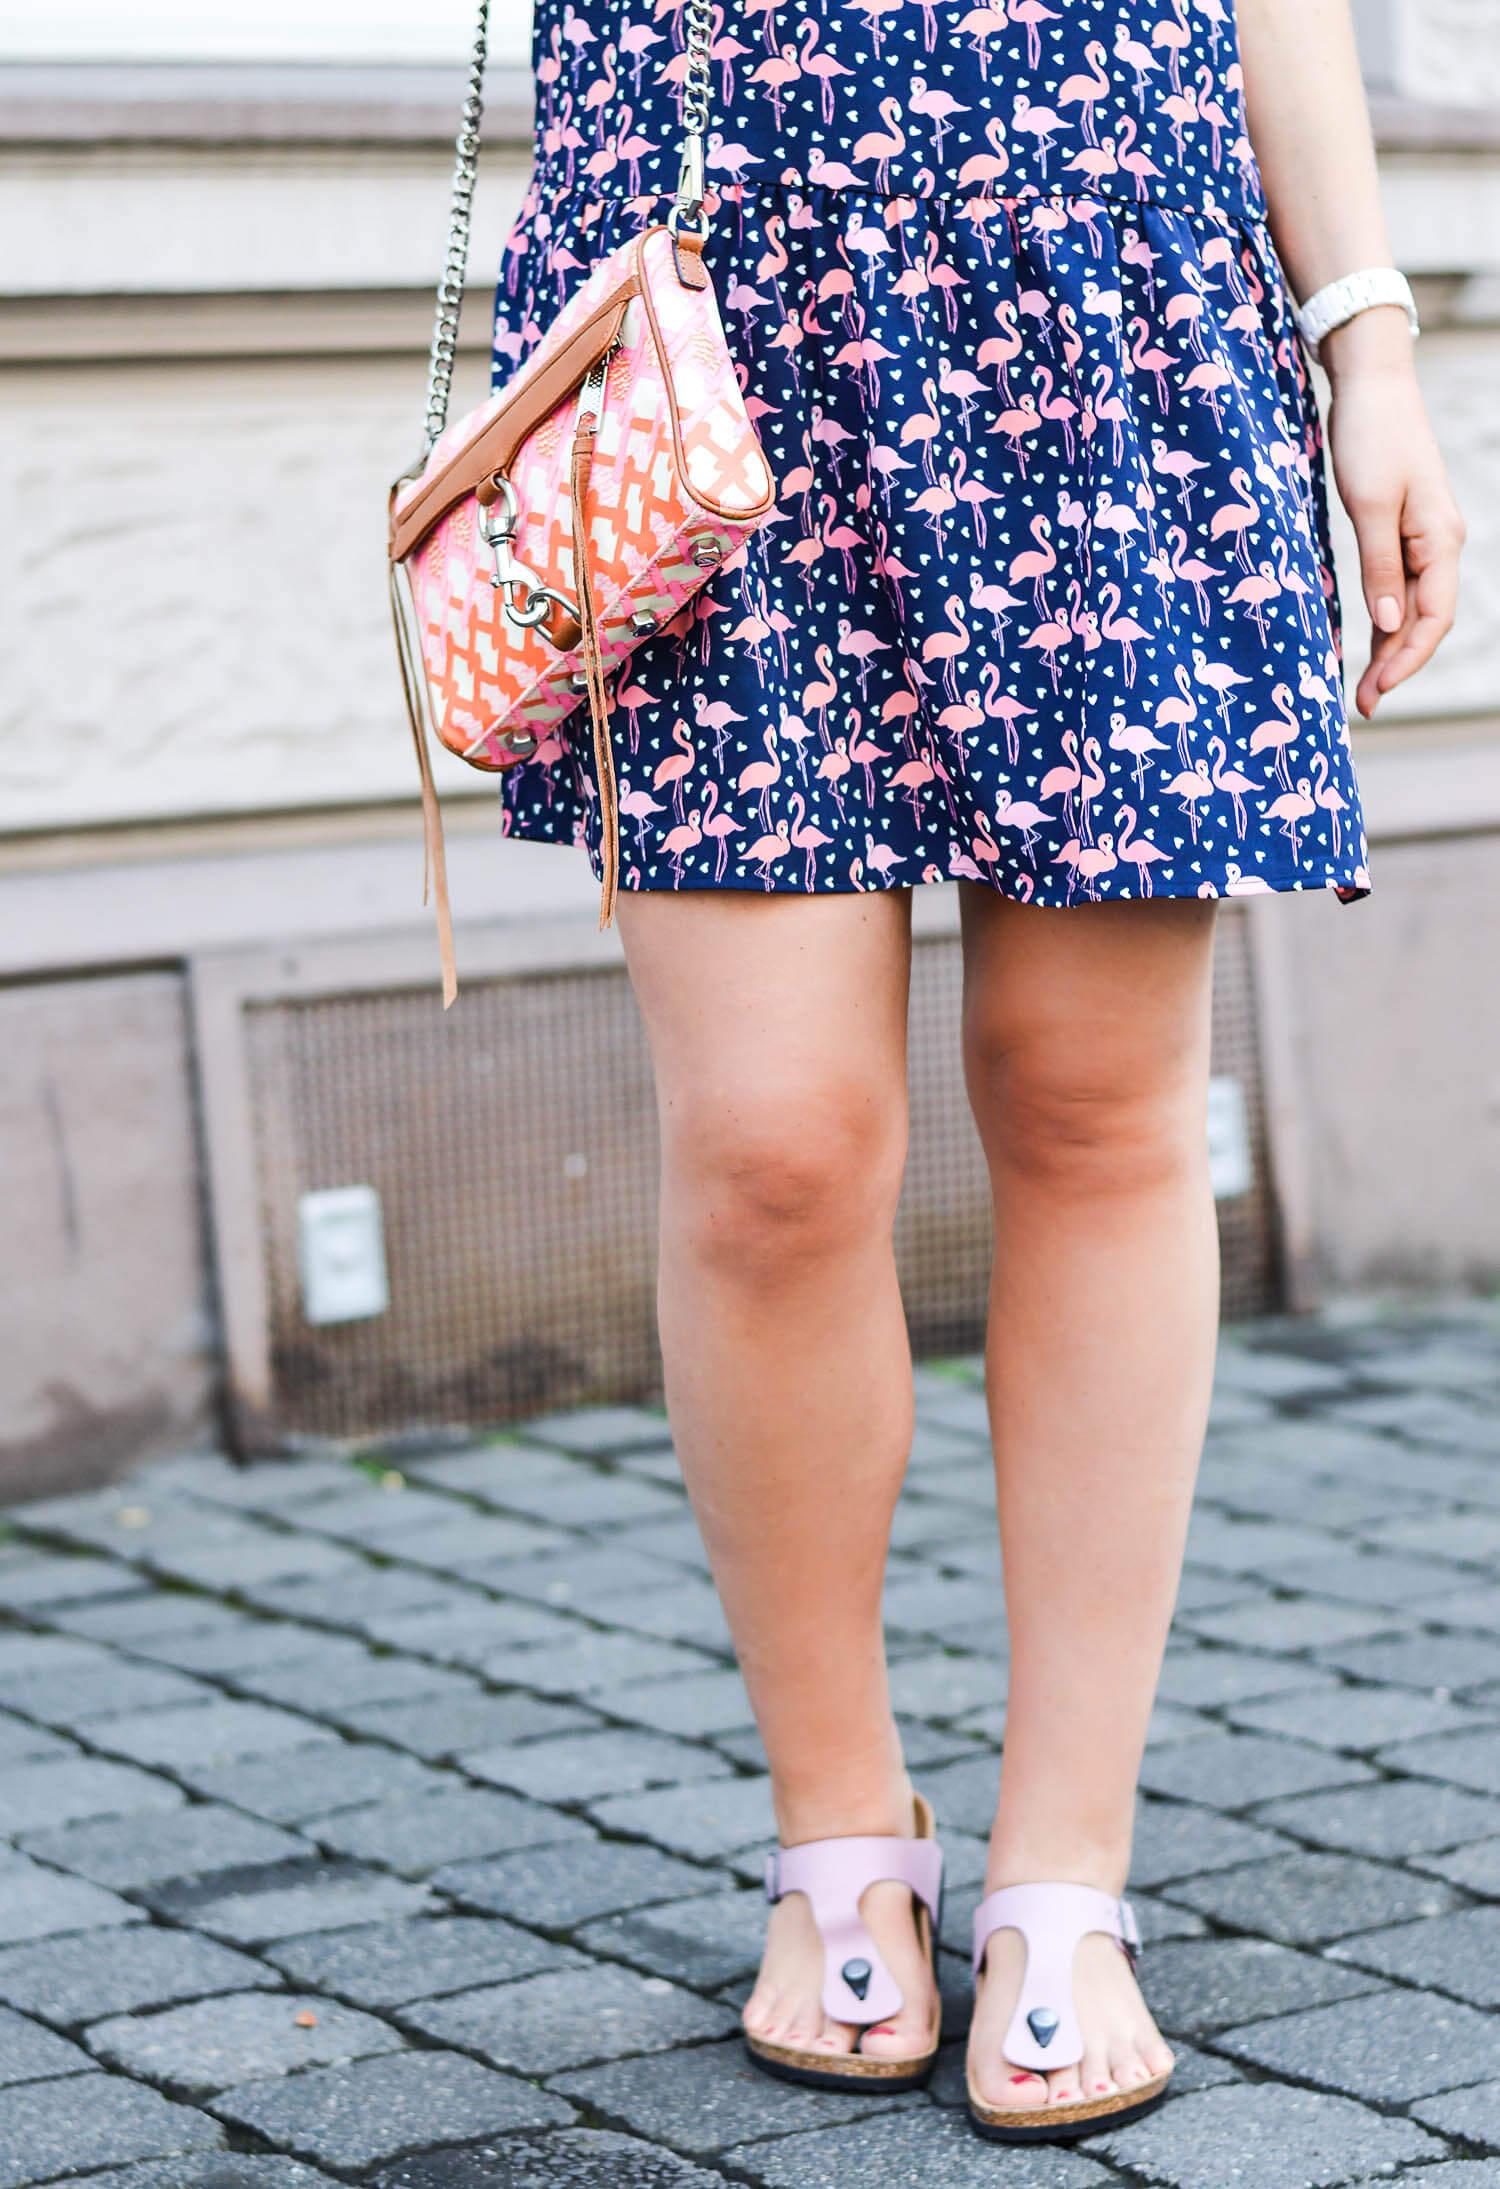 kationette-fashionblog-nrw-Outfit-Flamingo-Dress-Rebecca-Minkoff-Bag-Birkenstock